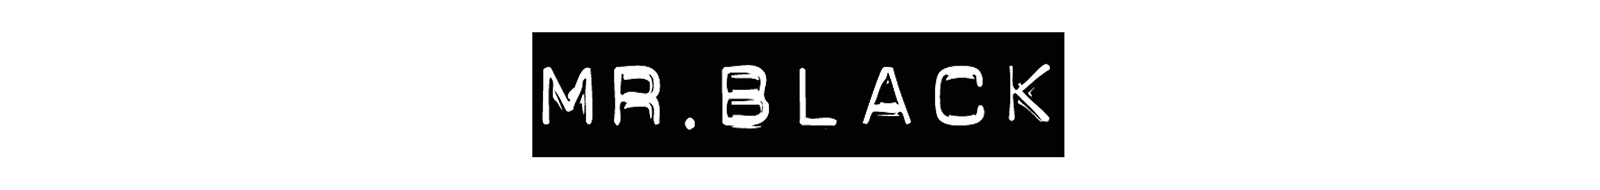 Mr. Black Effects